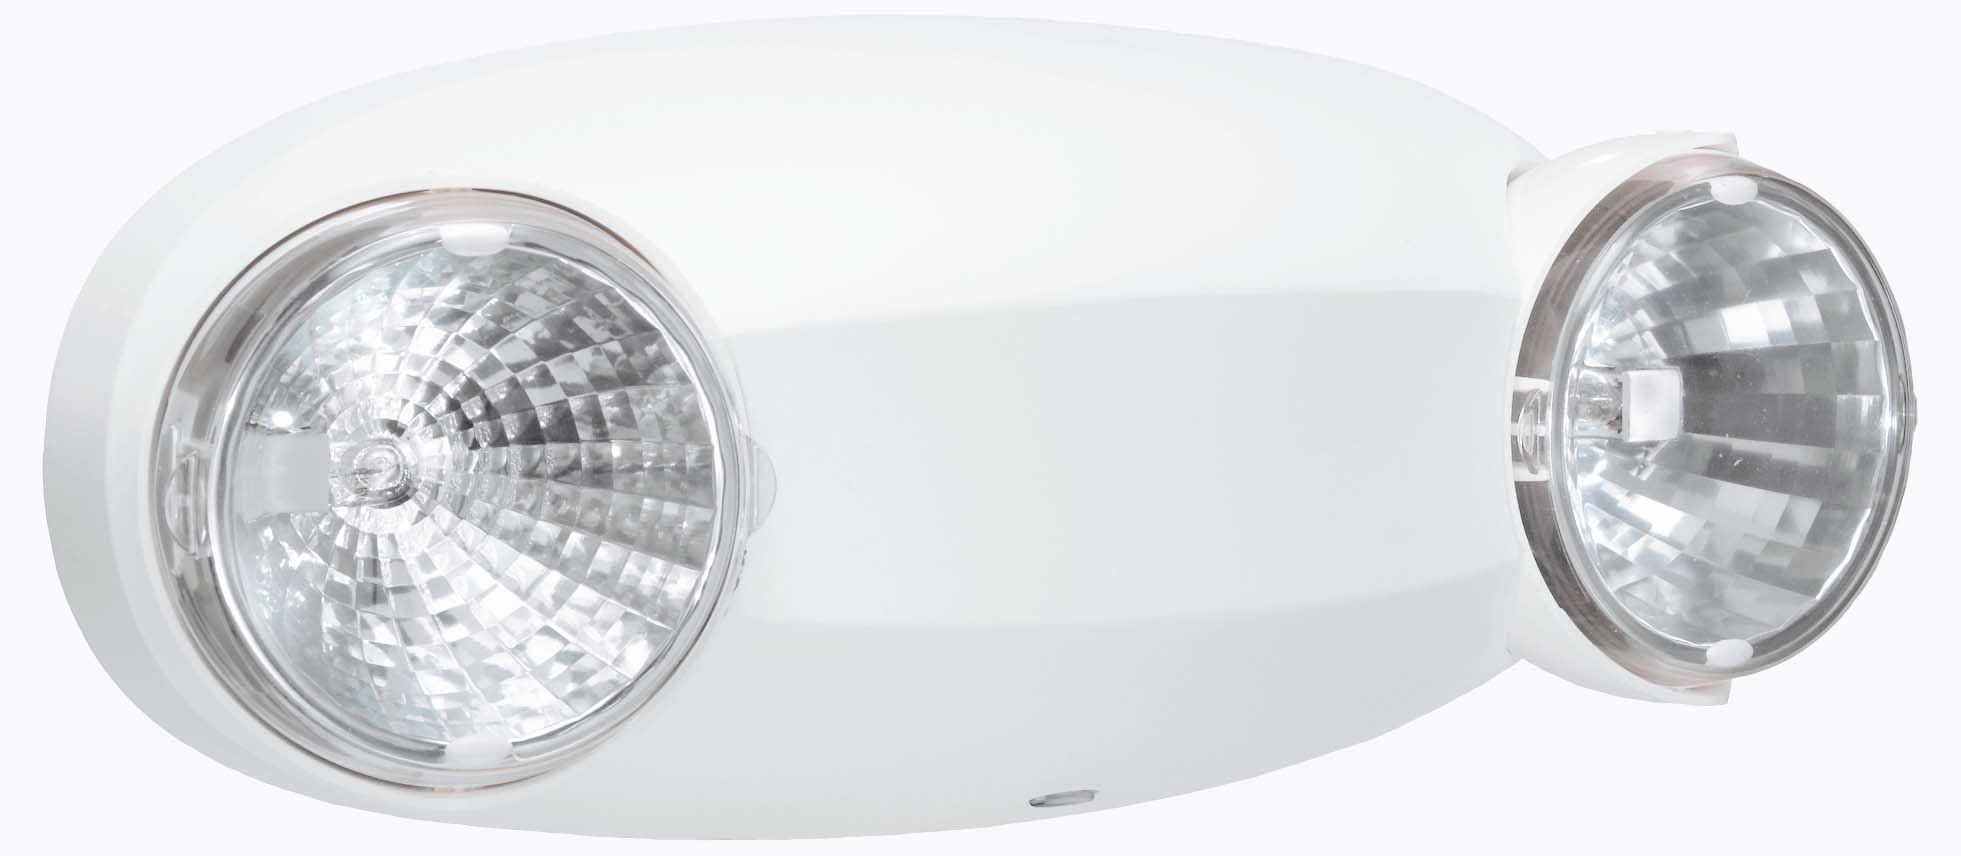 lithonia lighting recalls emergency